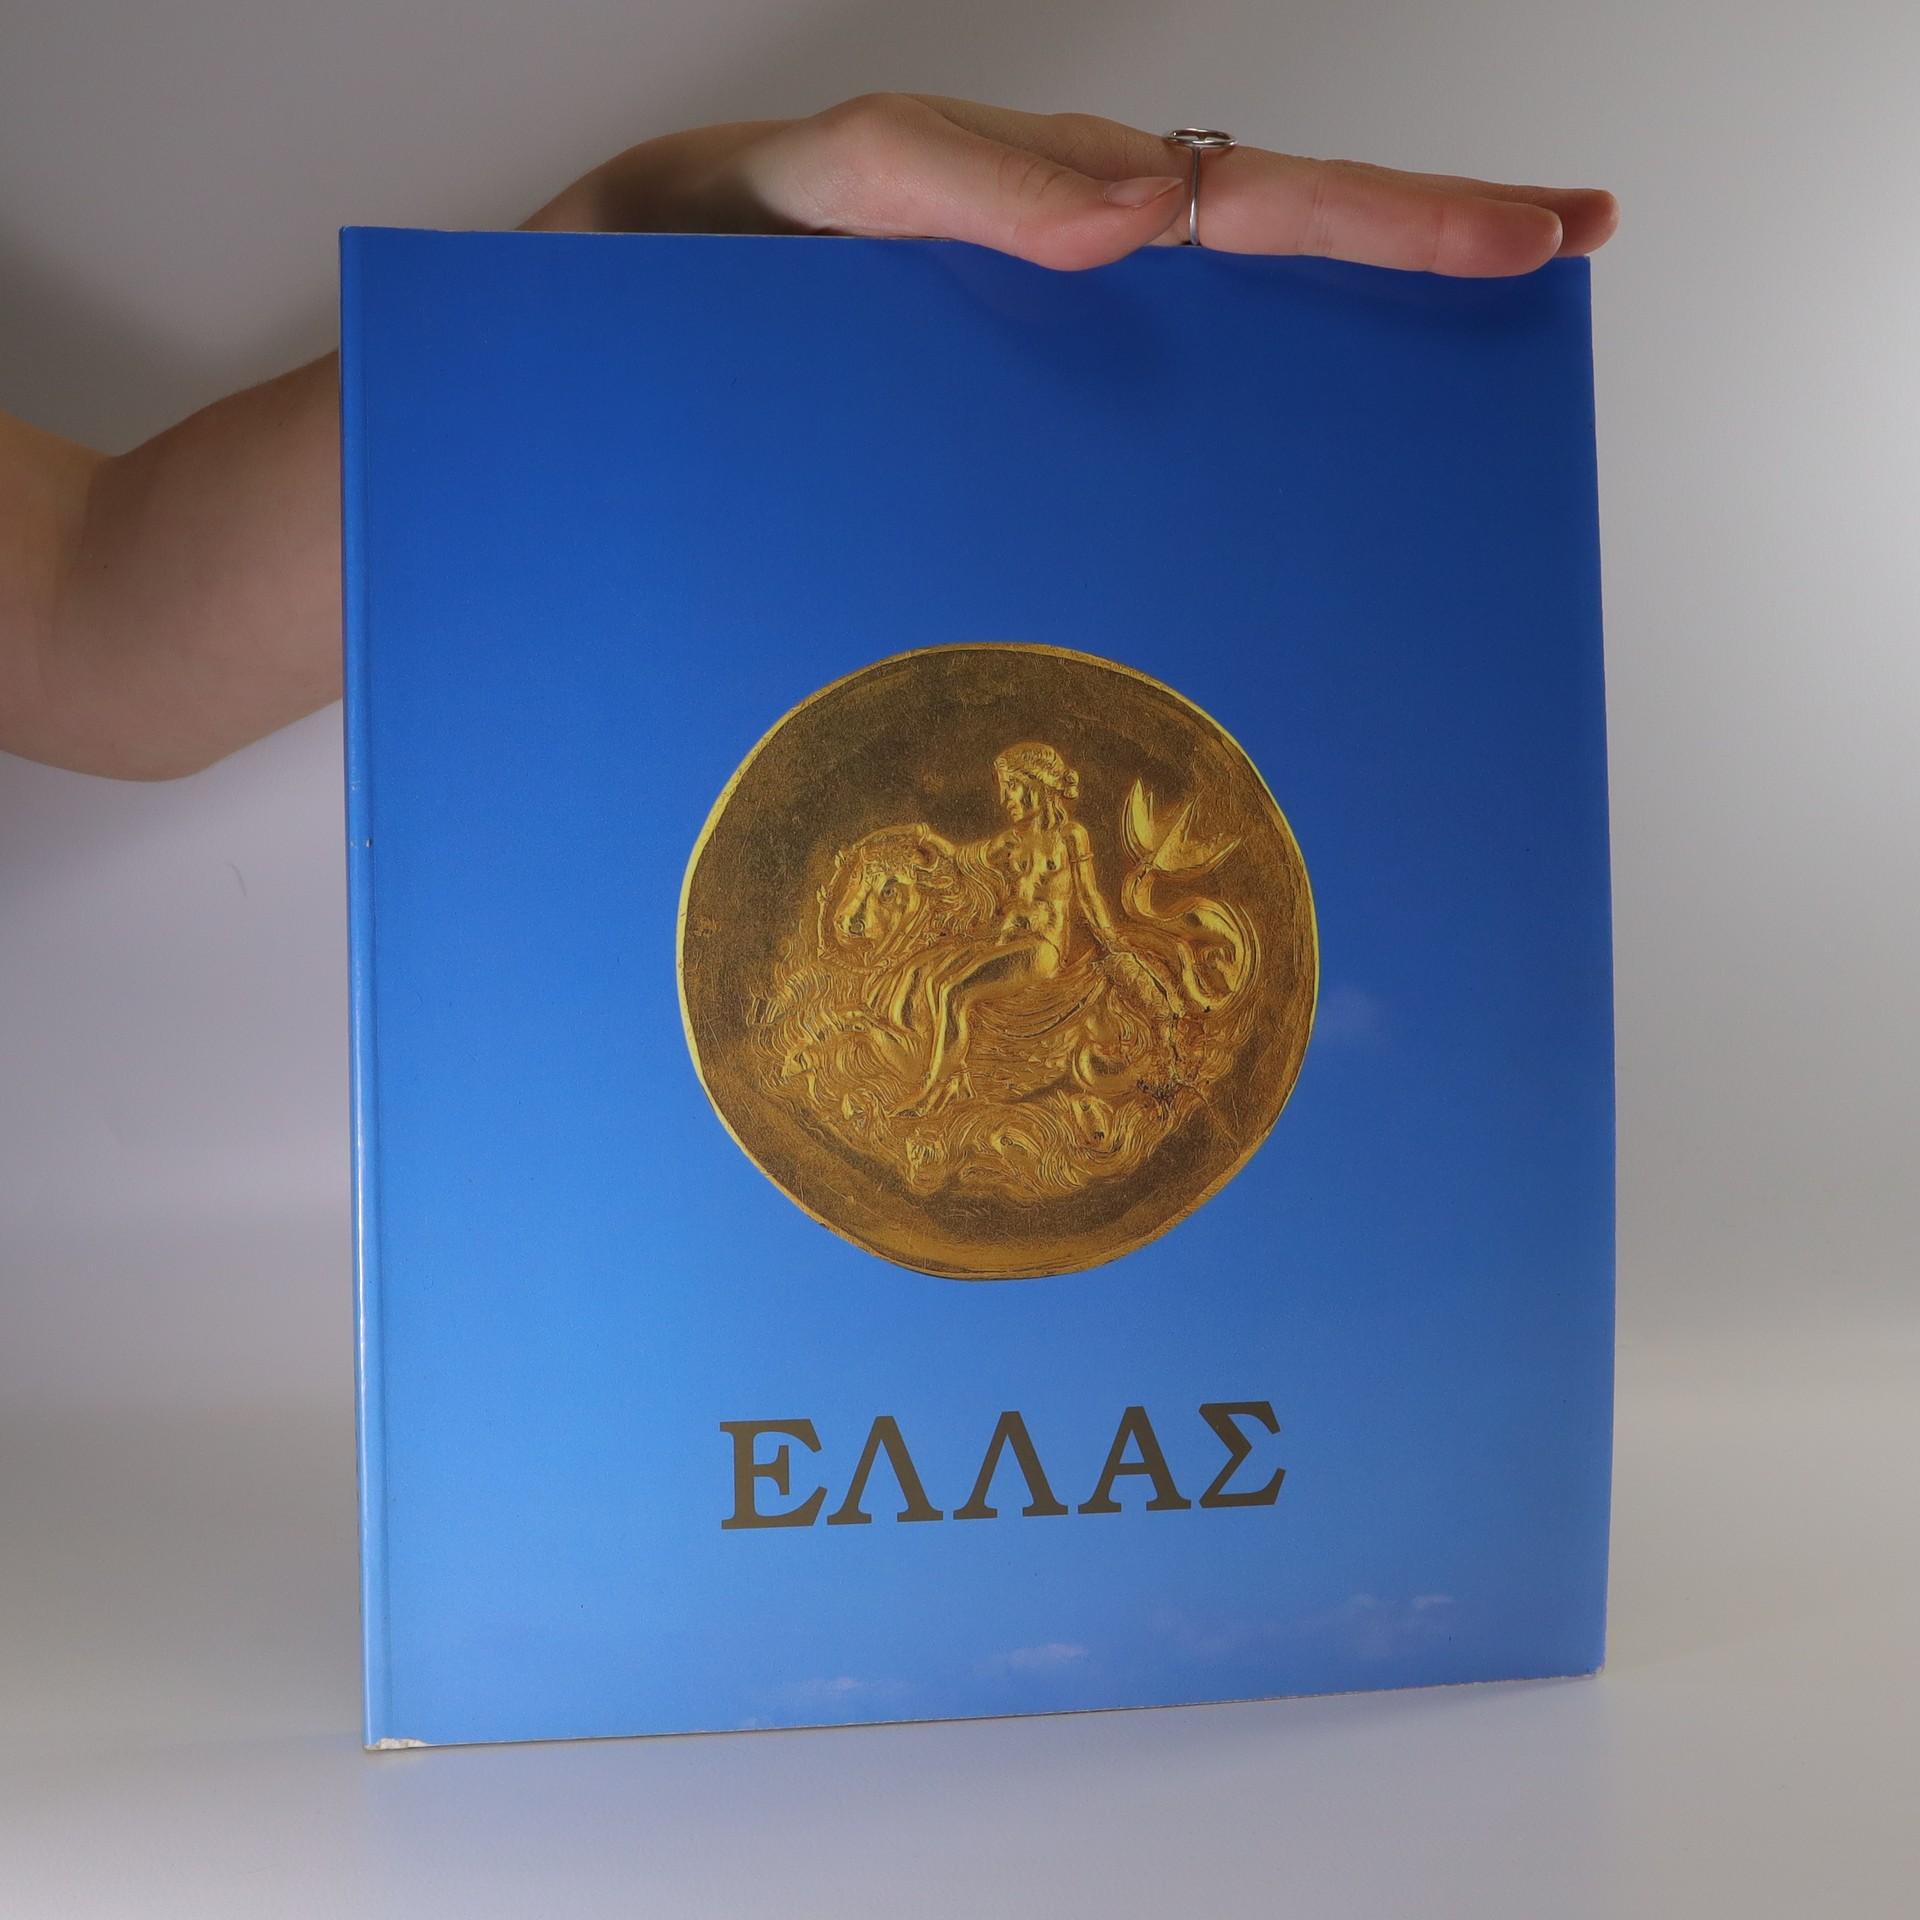 antikvární kniha ΕΛΛΑΣ (EUROPEAN EVANGELICAL ALLIANCE ANNUAL COUNCIL MEETIN ATHENS-GREECE), 1994